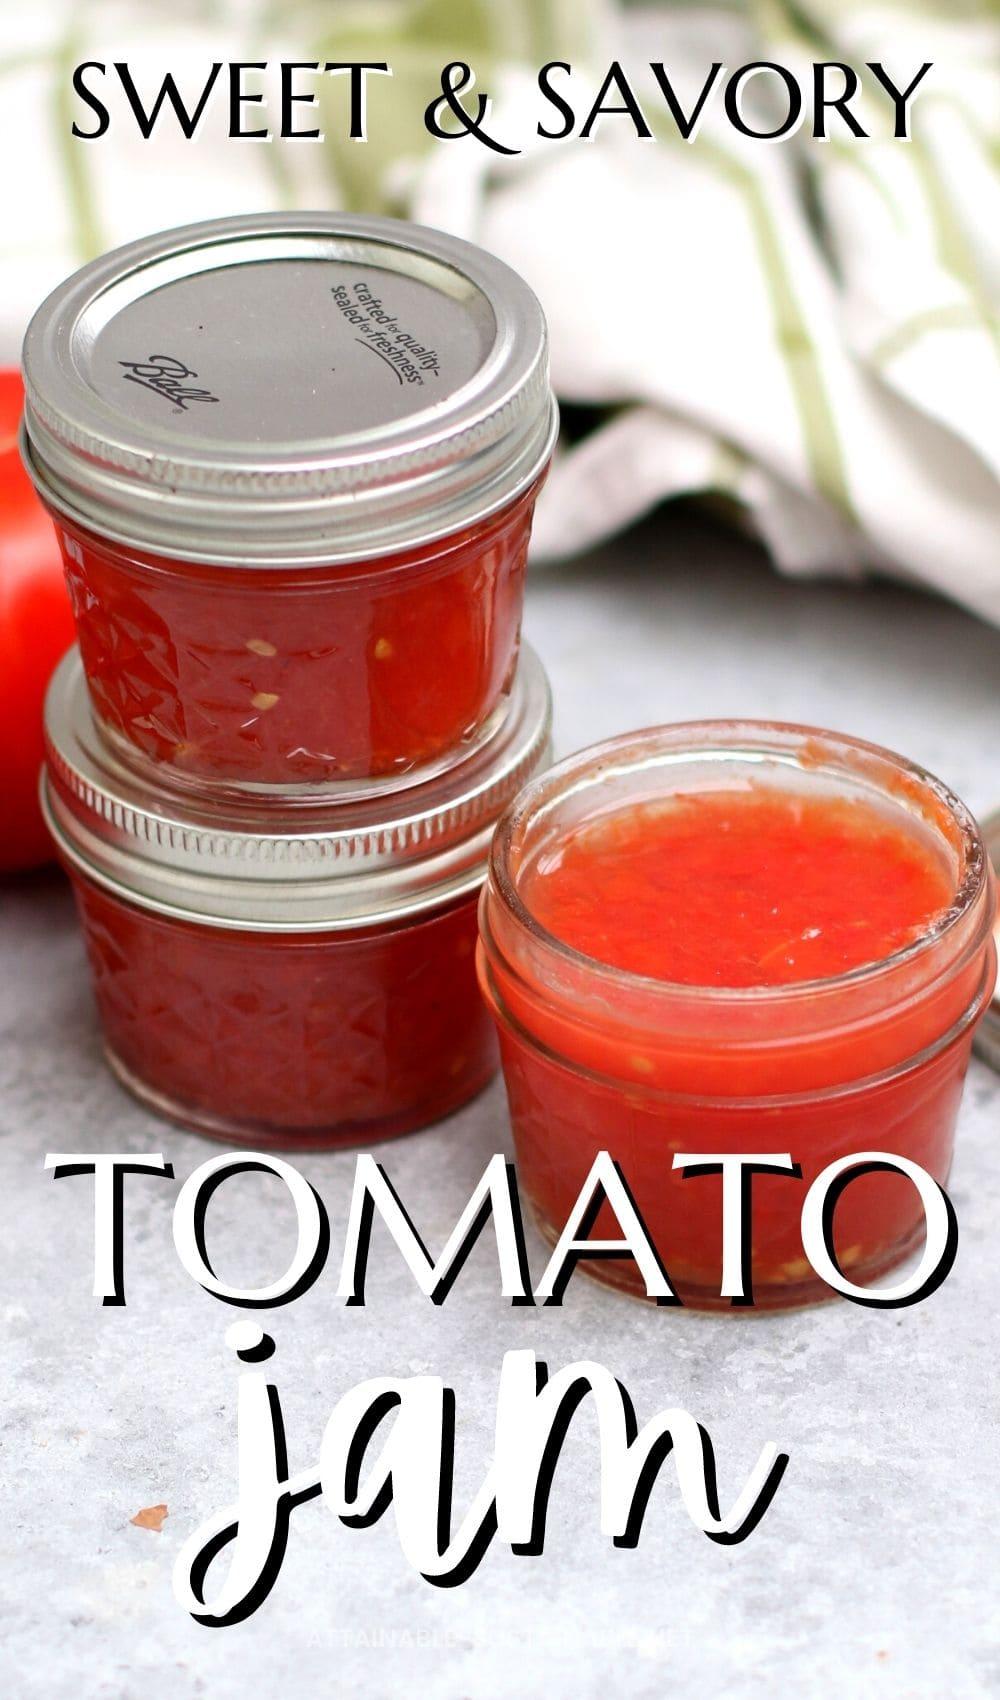 jars of tomato jam, one opened